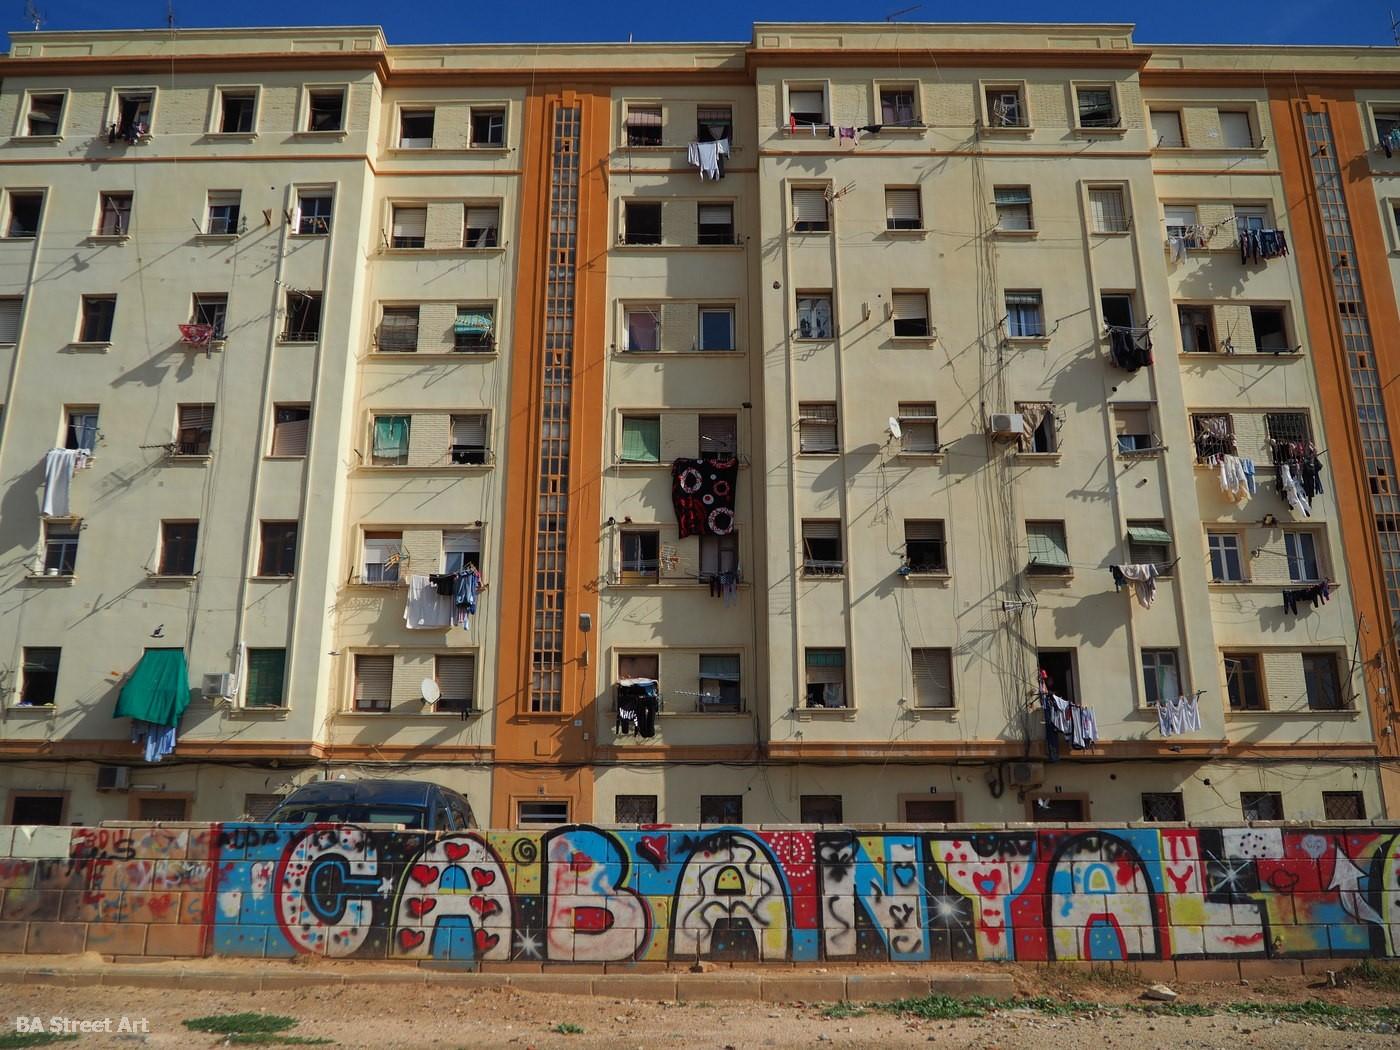 cabanyal barrio valencia españa neighborhood spain mural street art graffiti arte urbano playa nombre name